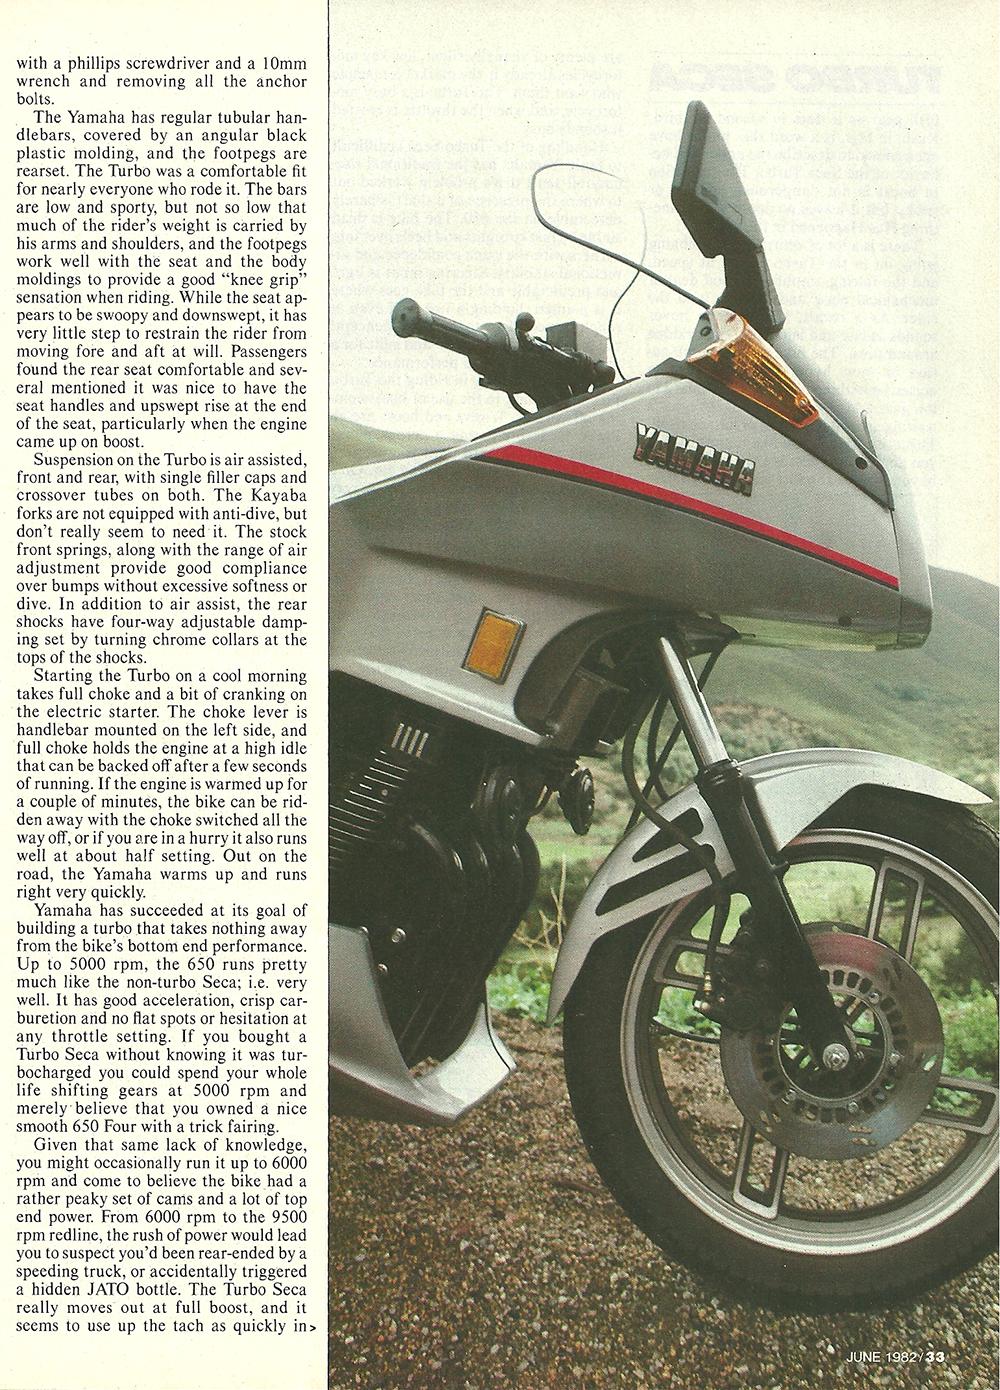 1982 Yamaha Turbo Seca 650 road test 06.jpg